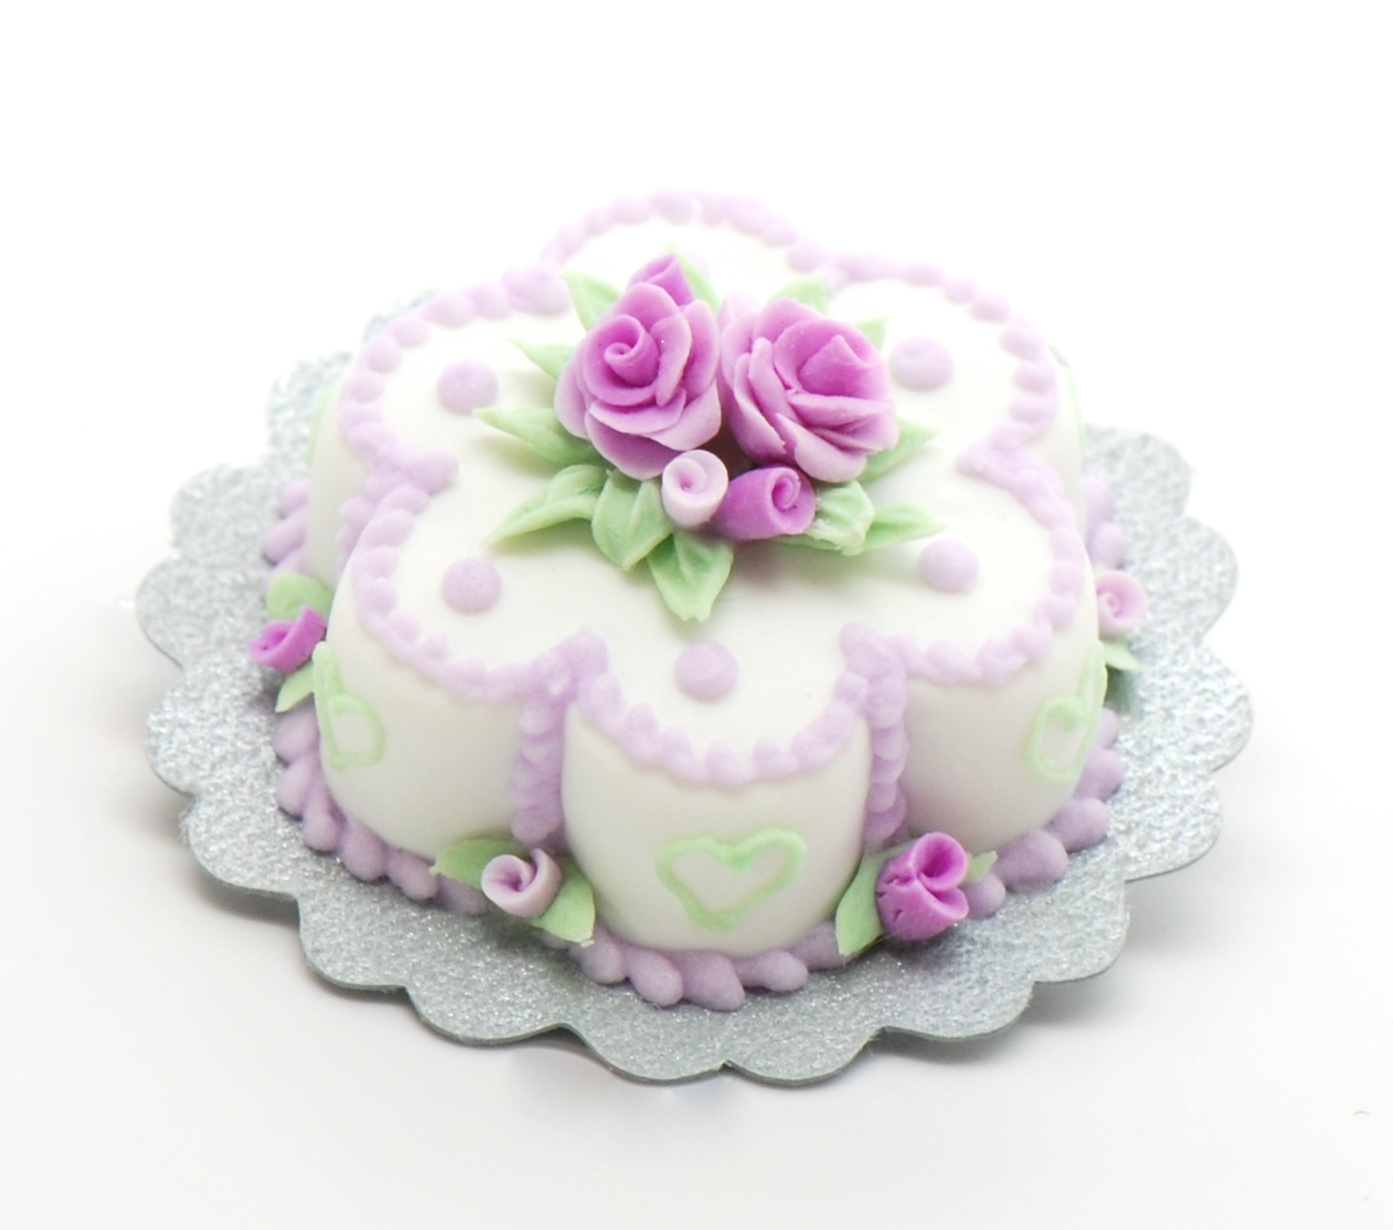 Cake Decorating Glue